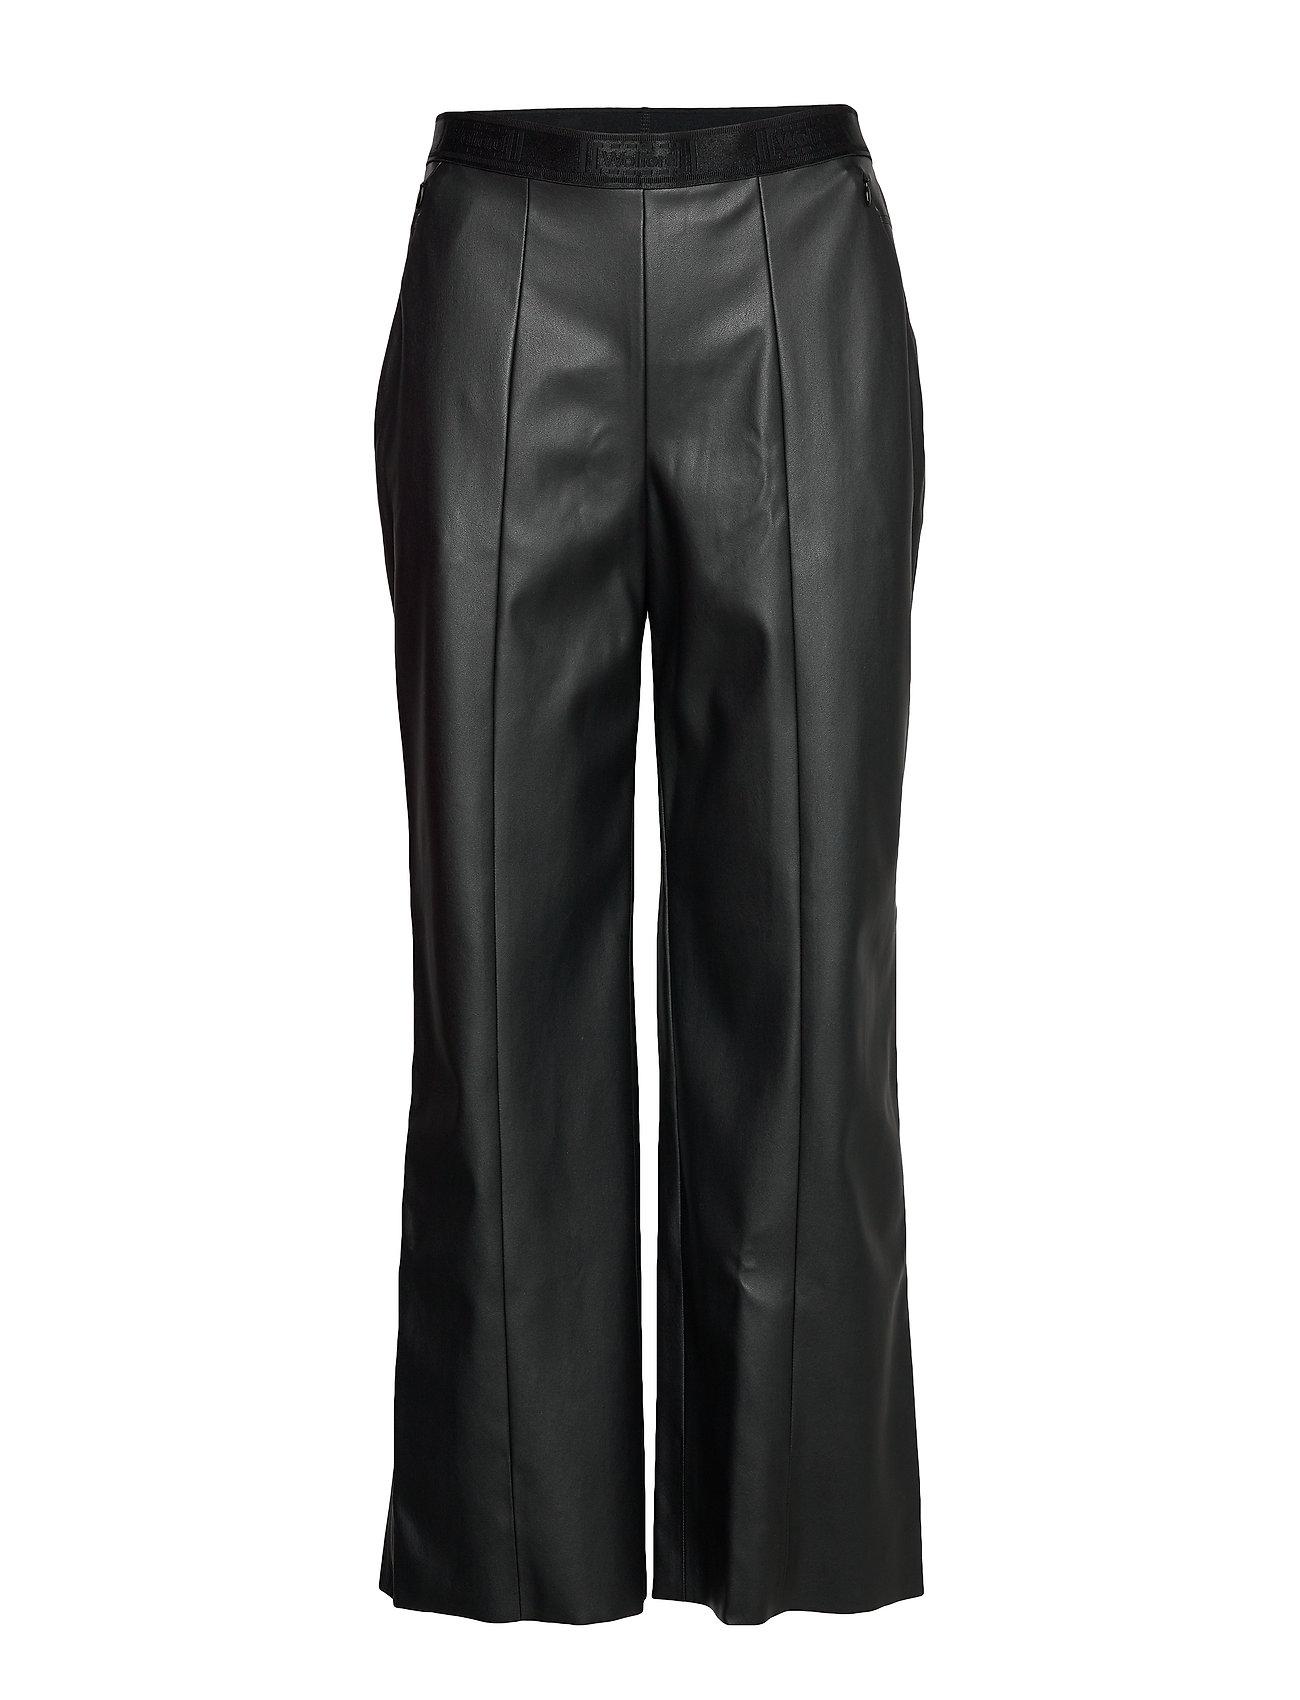 Image of Estella Trousers Vide Bukser Sort Wolford (3314199361)